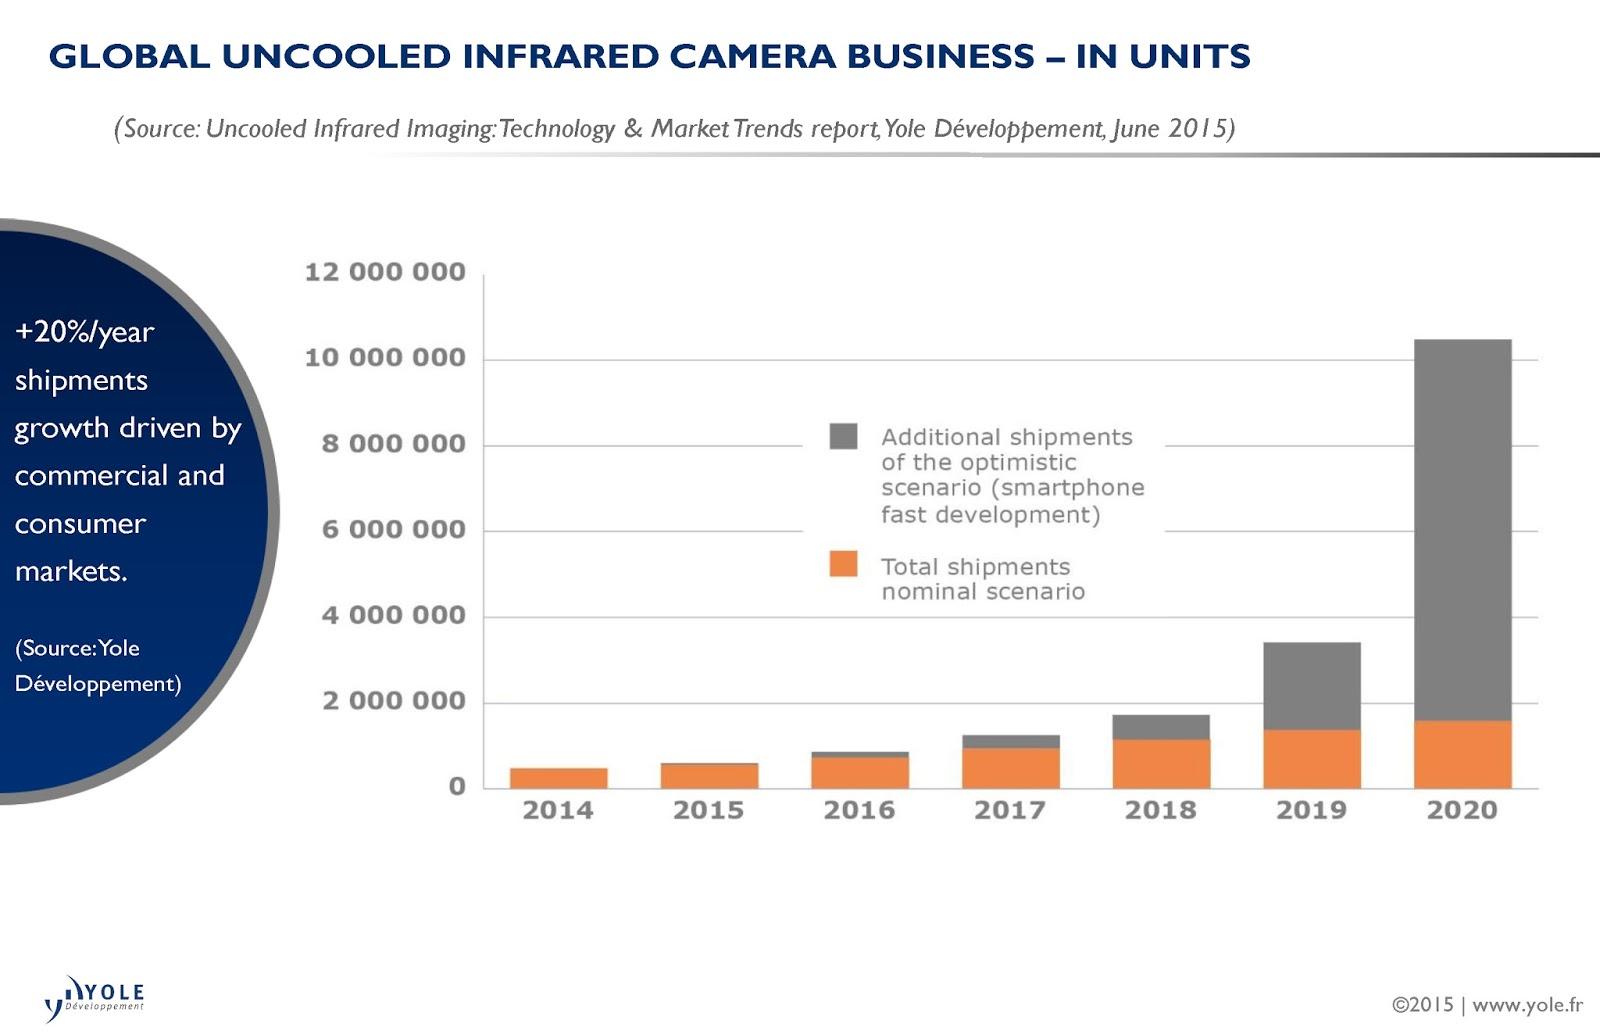 Infrared Report Diagram Wiring Portal Transmitter Circuit Image Sensors World Yole On Uncooled Ir Imaging Market Rh Blogspot Com Camera Rays